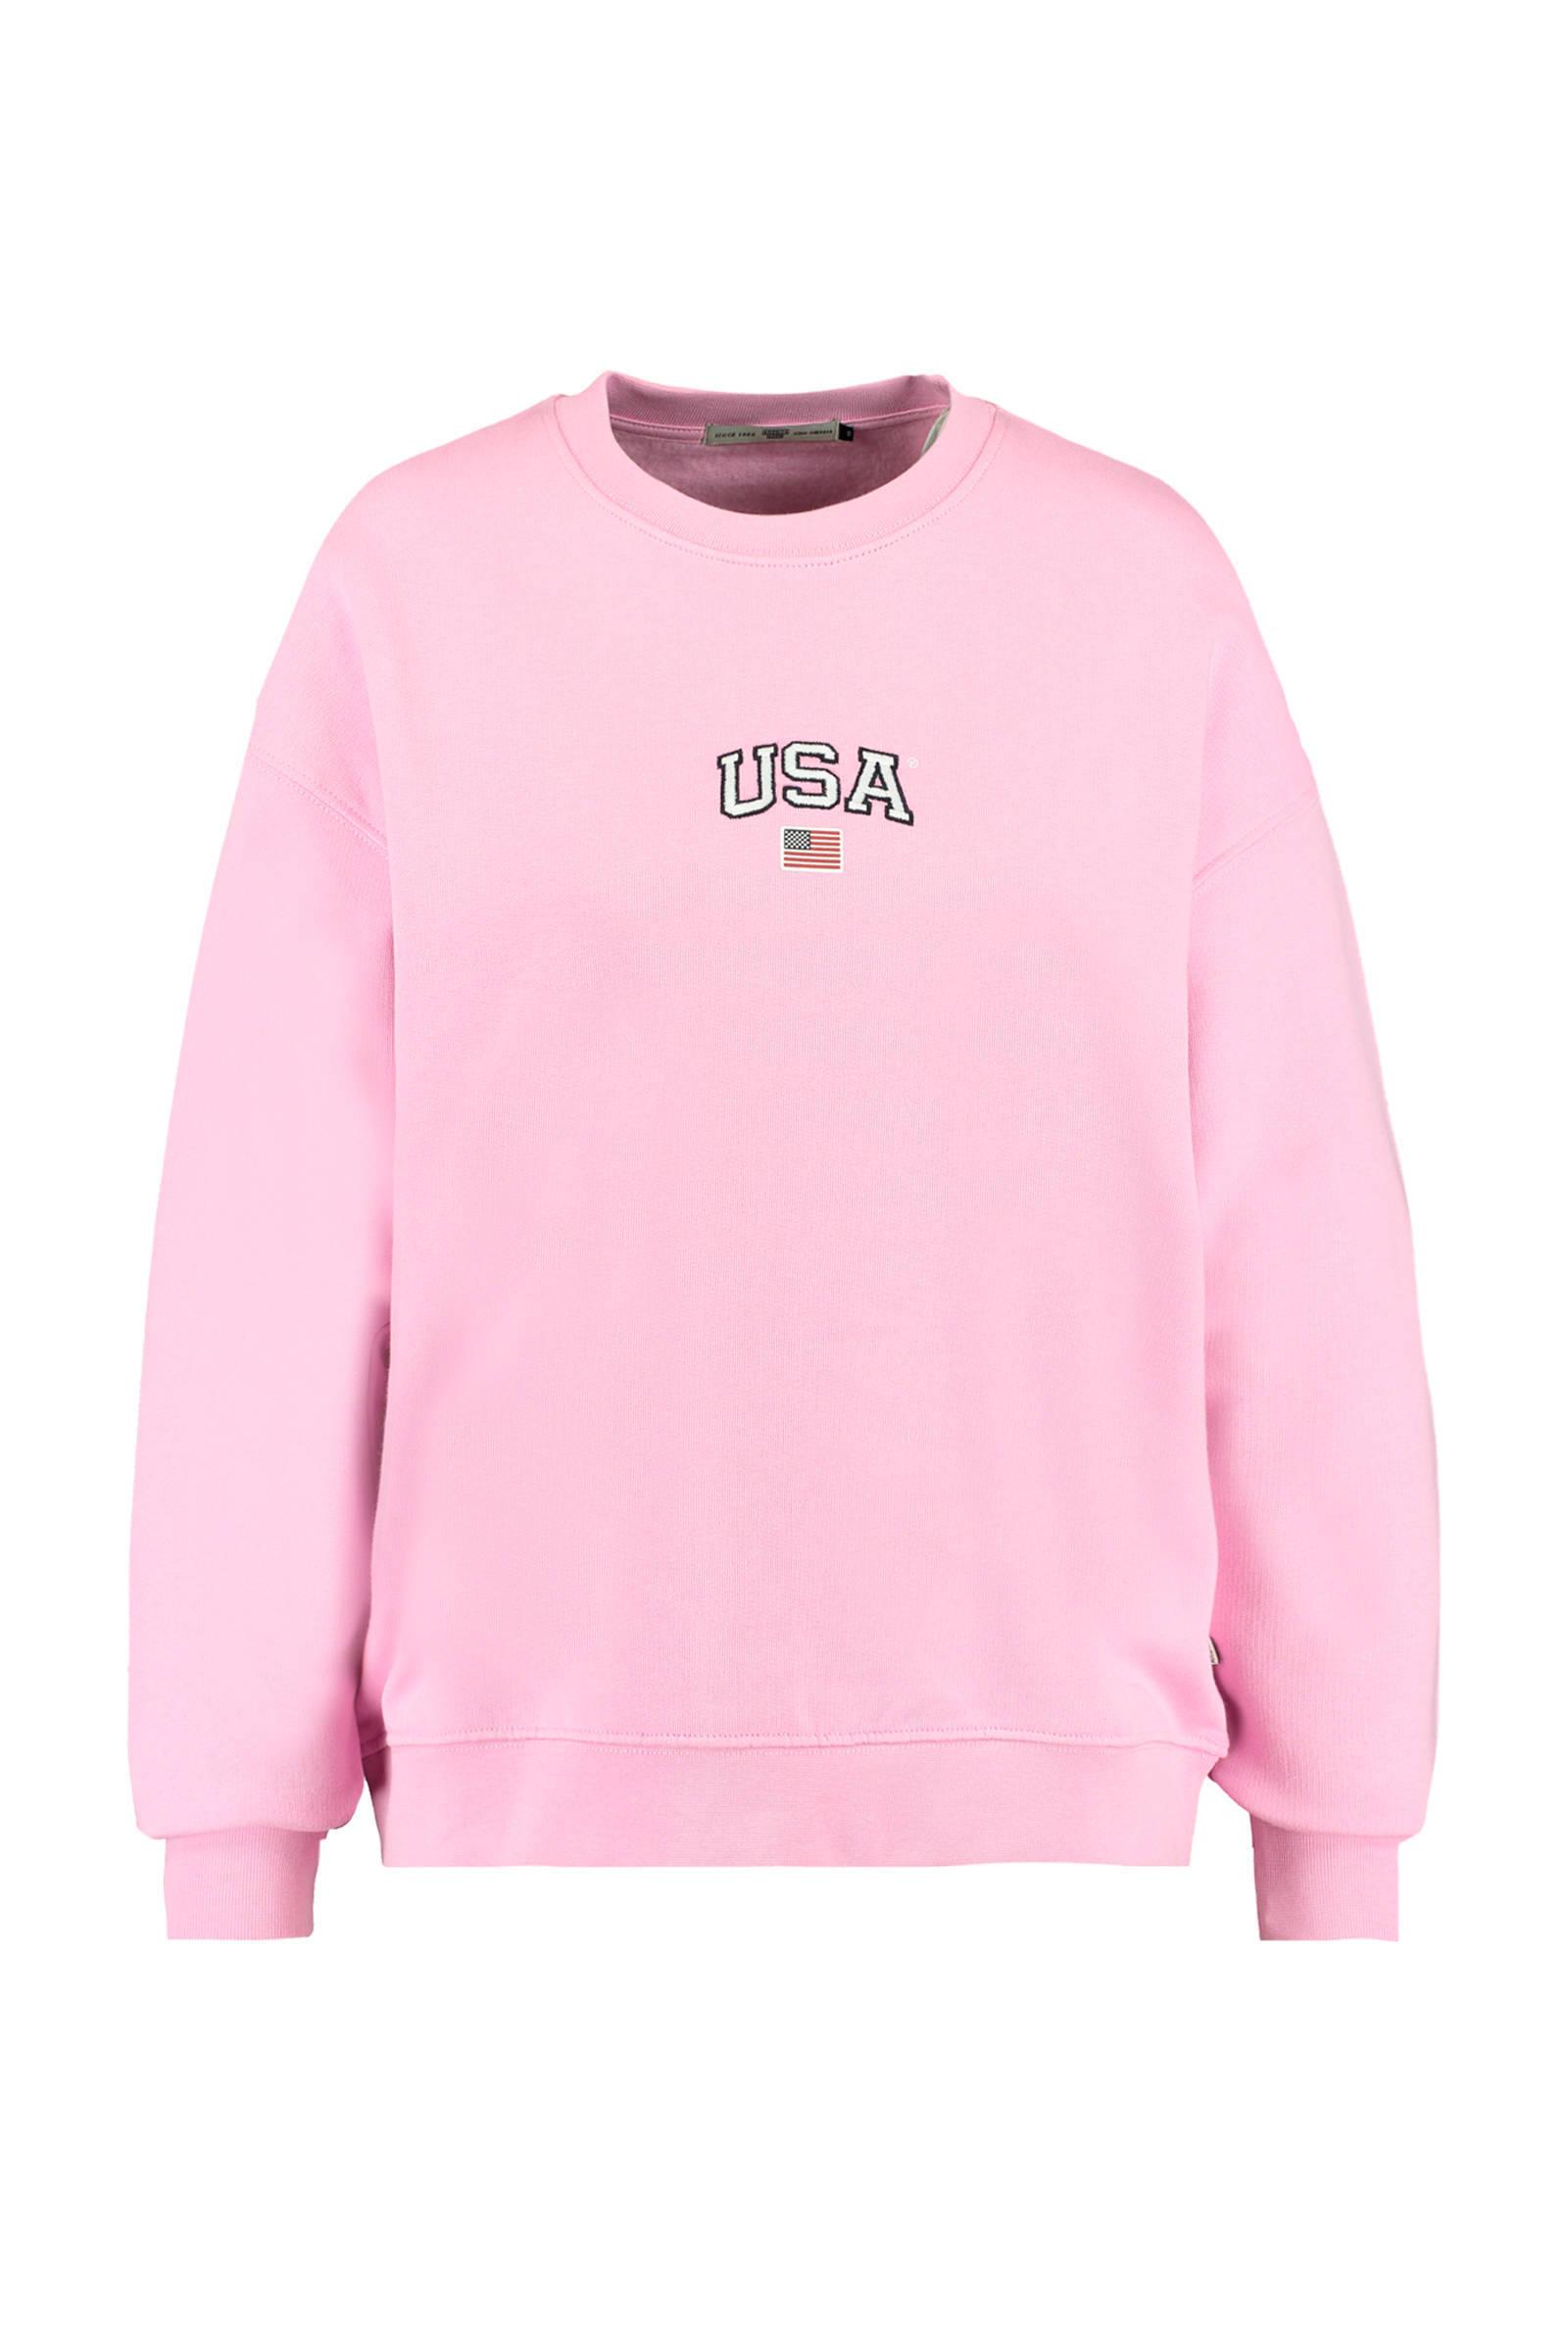 America Today sweater lichtgroen | wehkamp